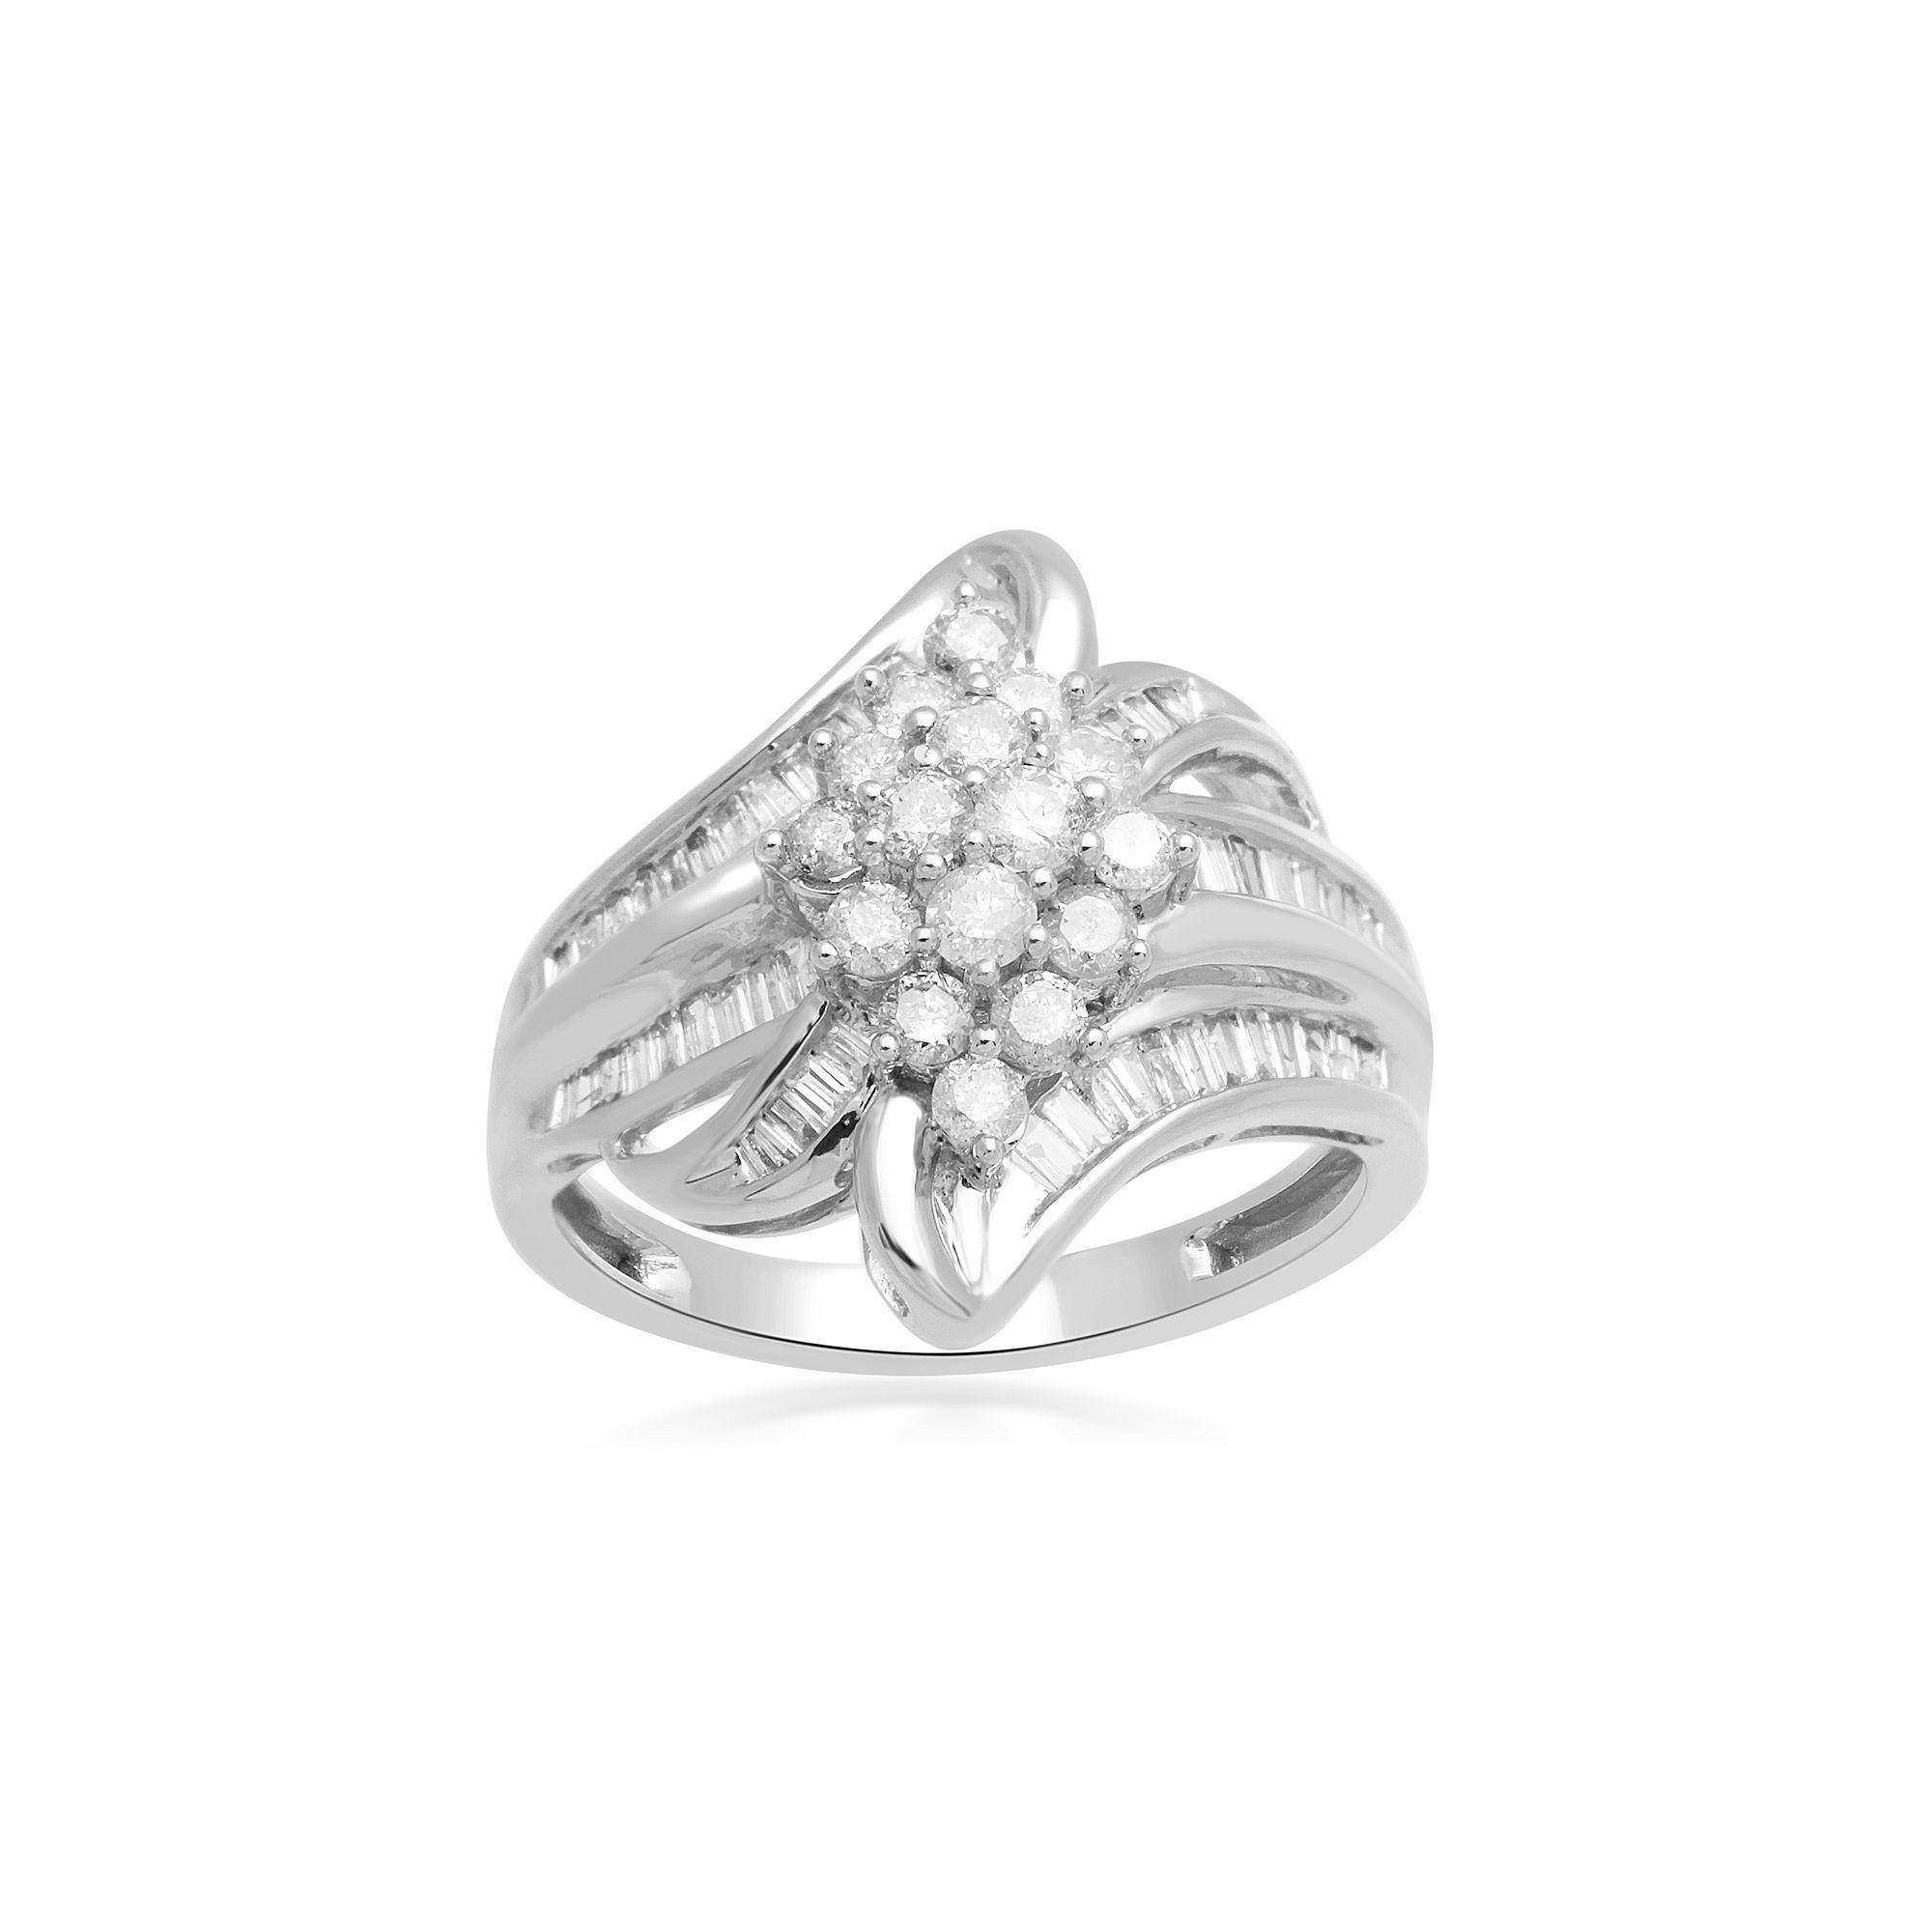 Womens 1 CT. T.W. White Diamond 10K Gold Cocktail Ring